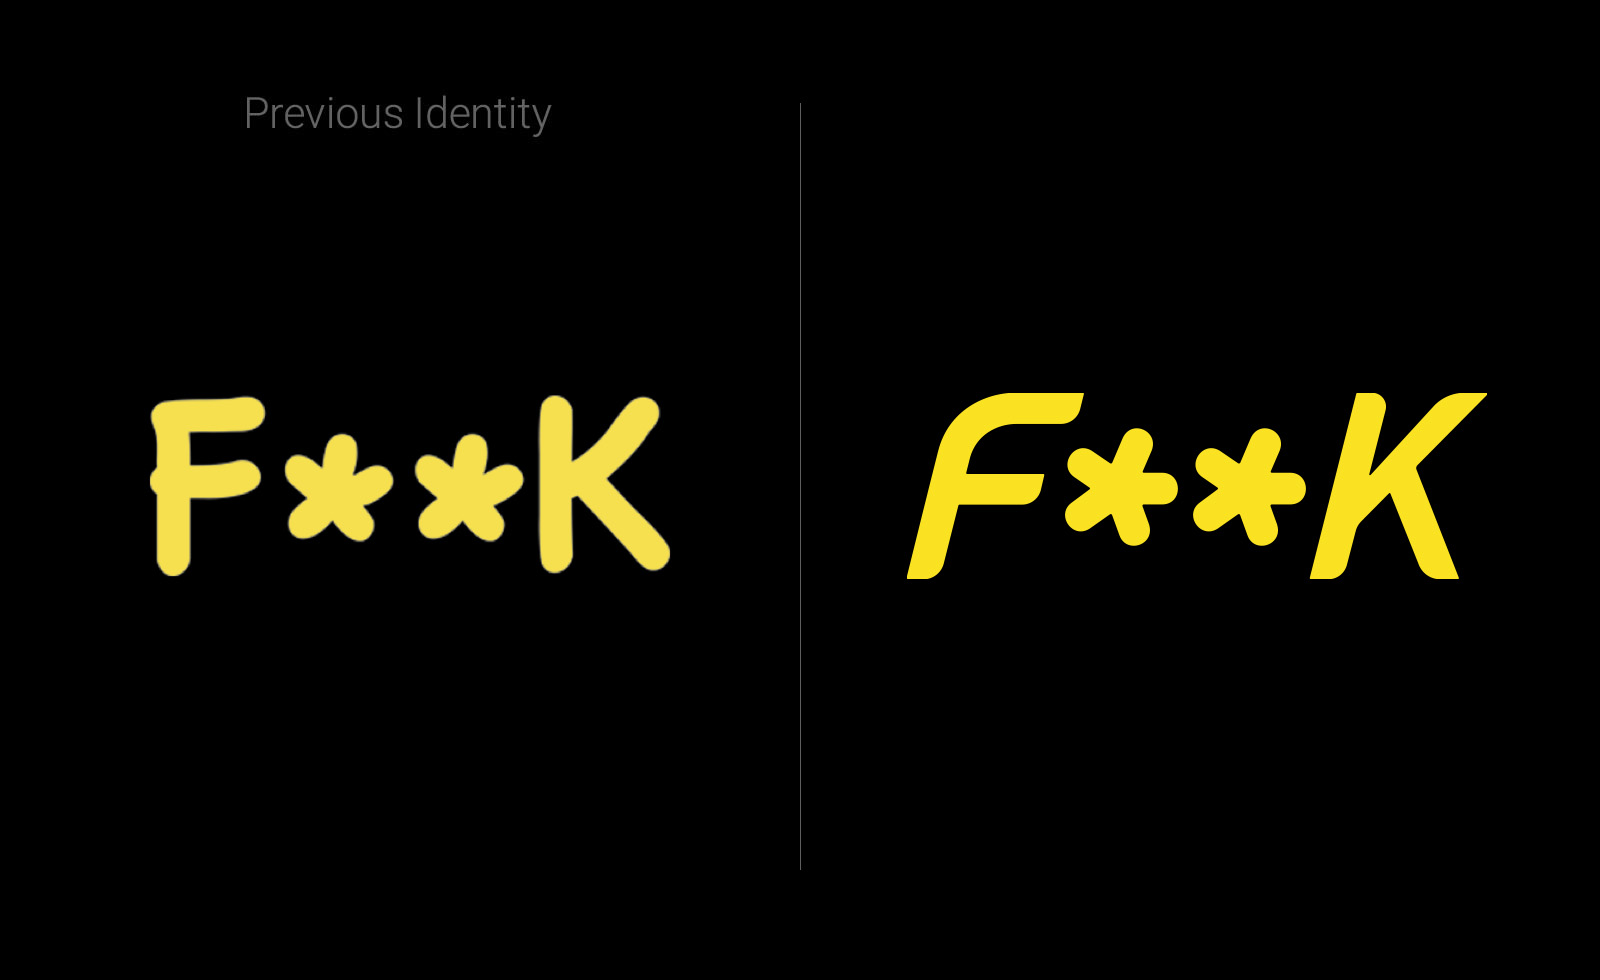 effek F**K beachwear rebranding brand logo pitscheider maggipinto